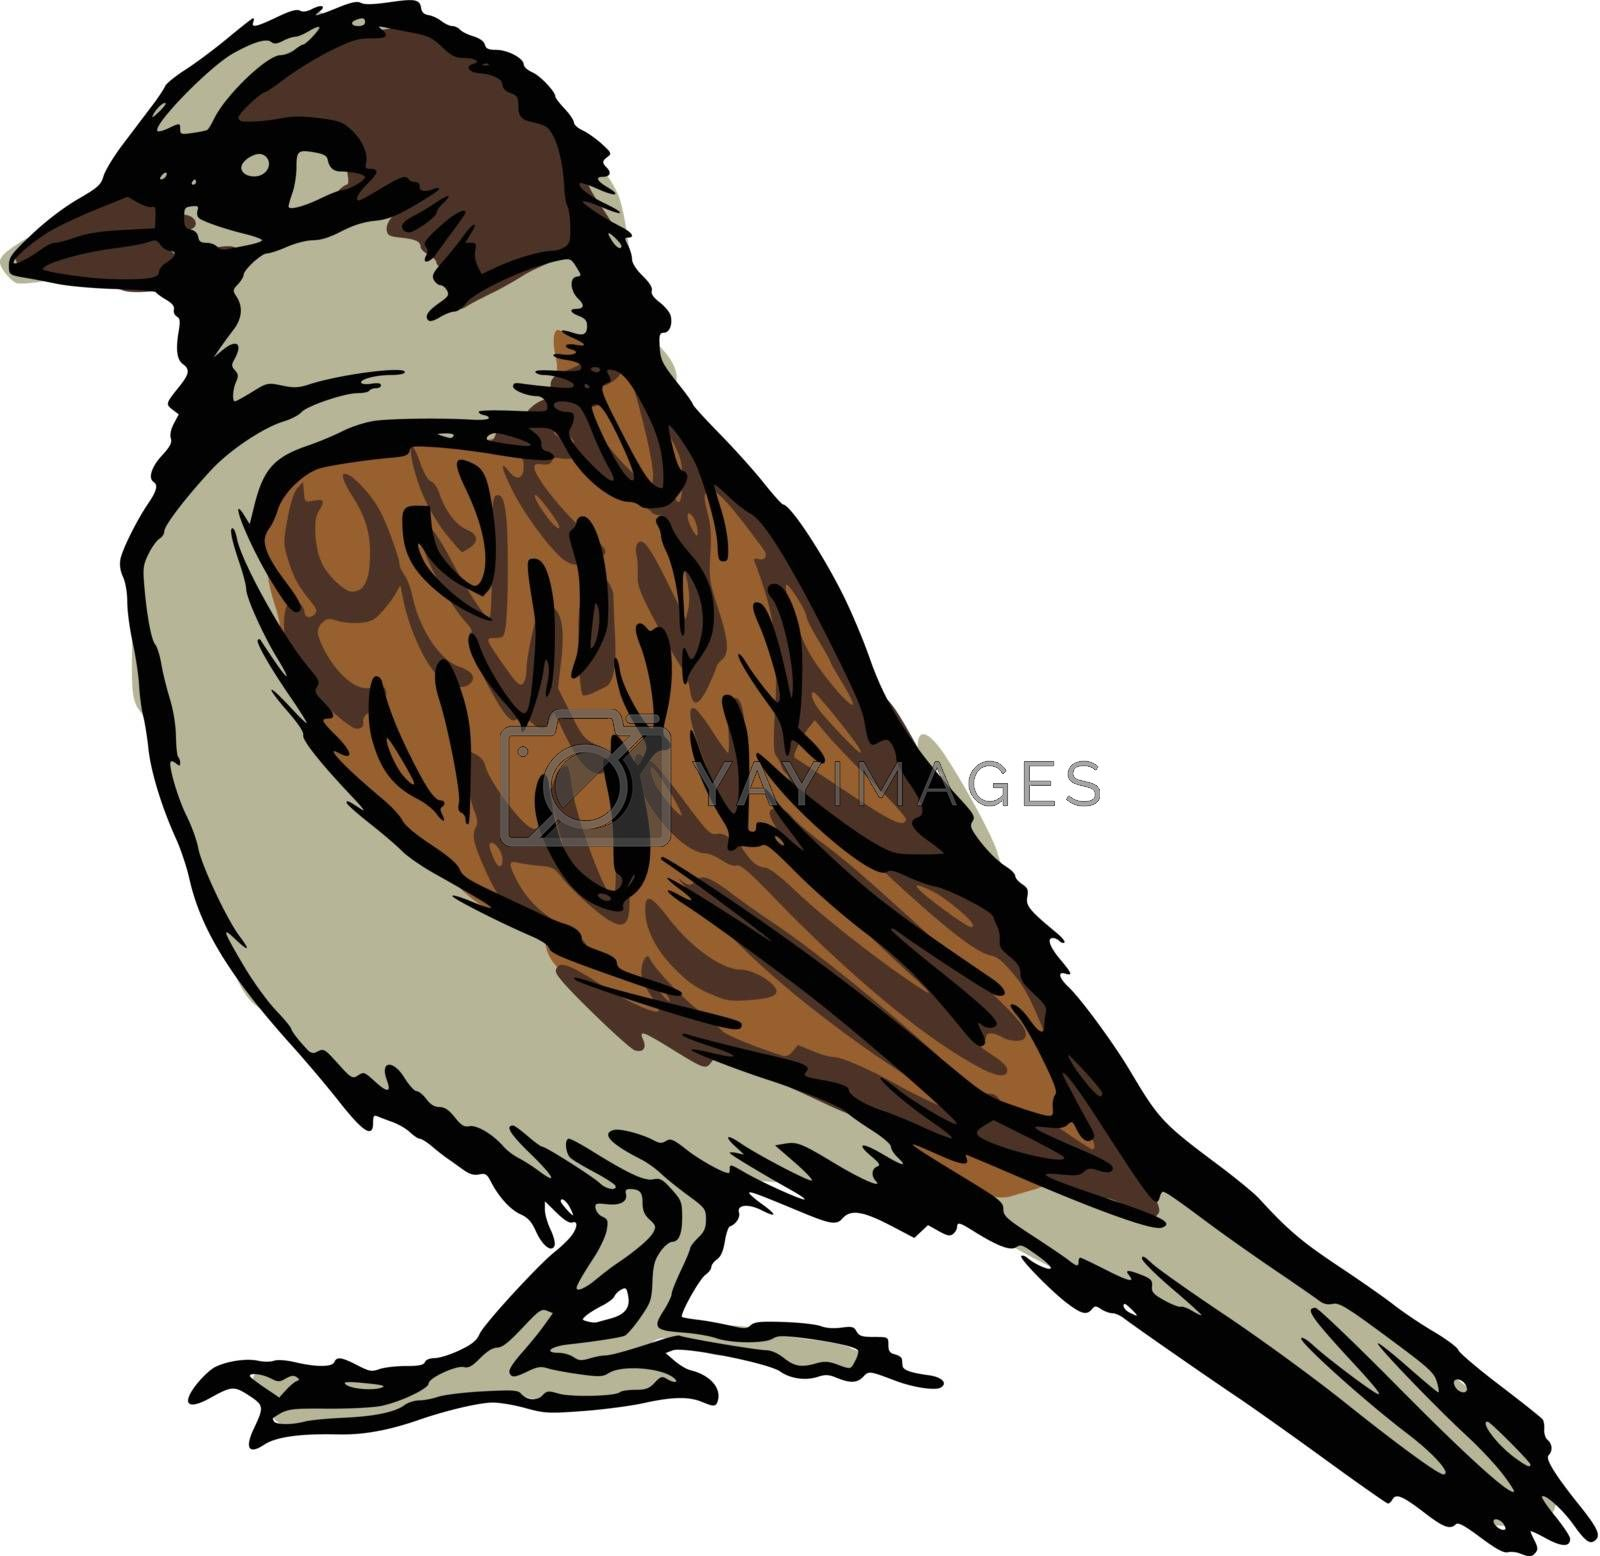 hand drawn, sketch, cartoon illustration of sparrow